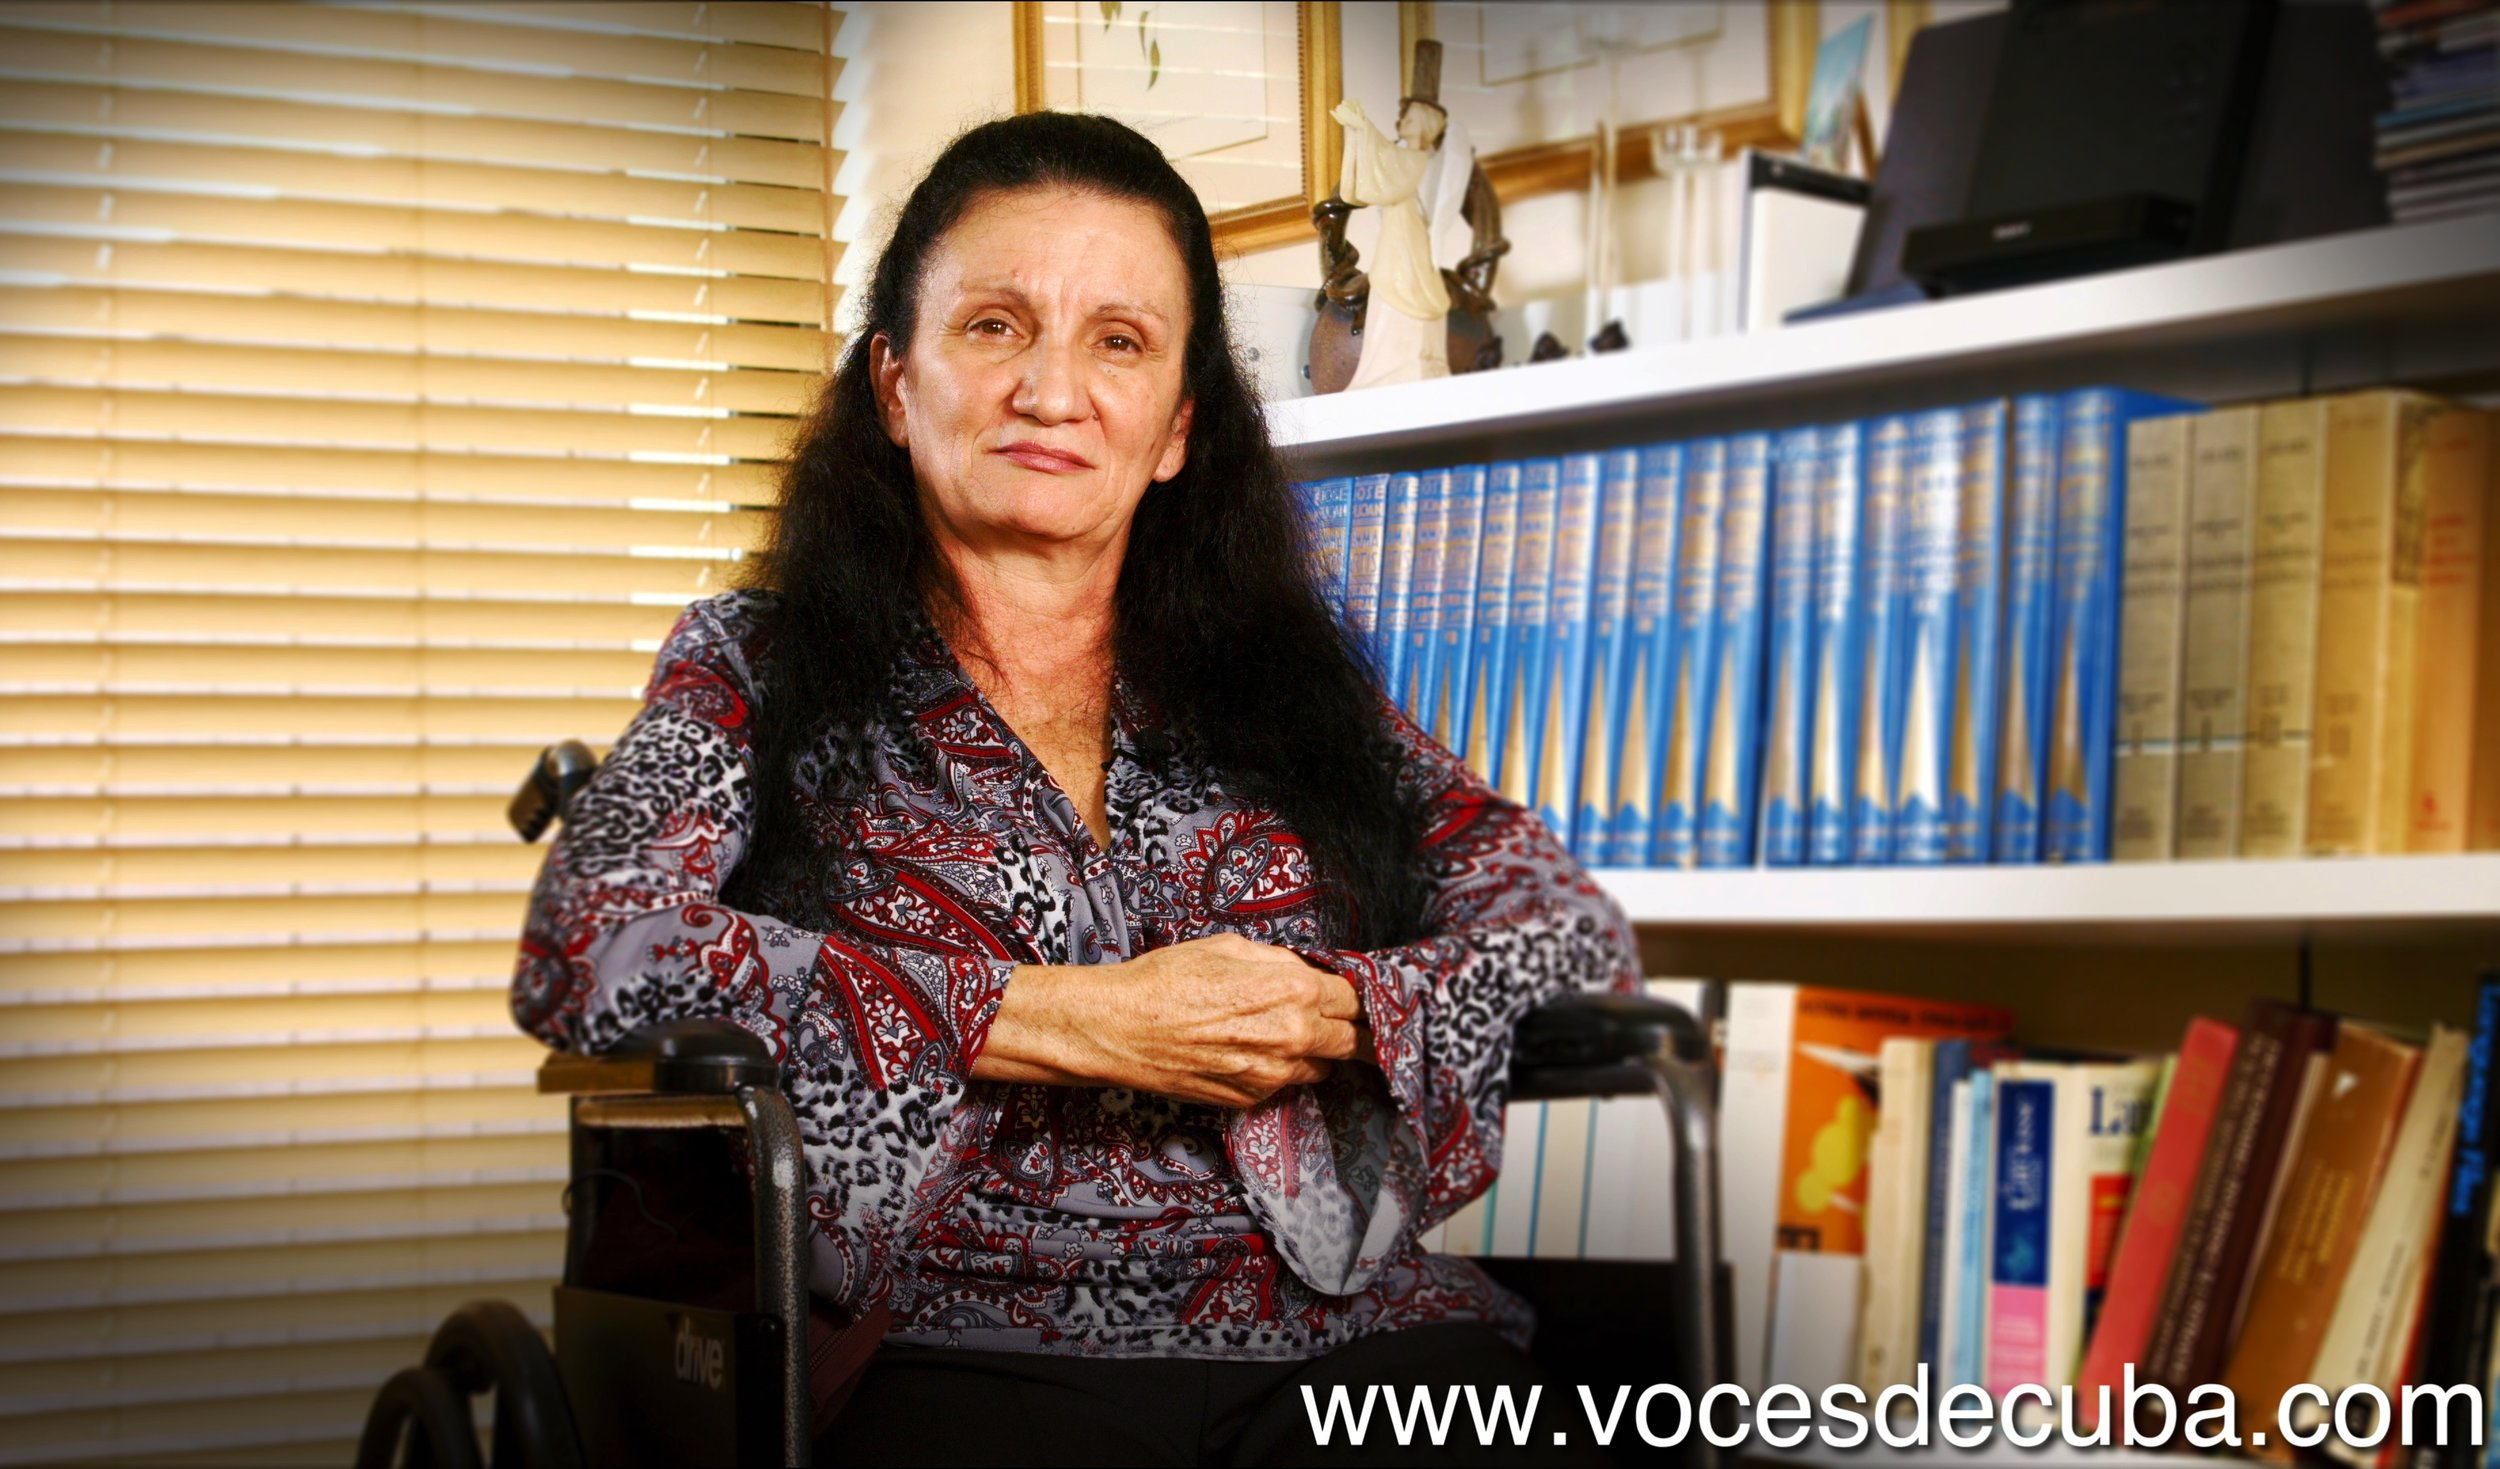 VOCES DE CUBA SIRLEY 001.jpg